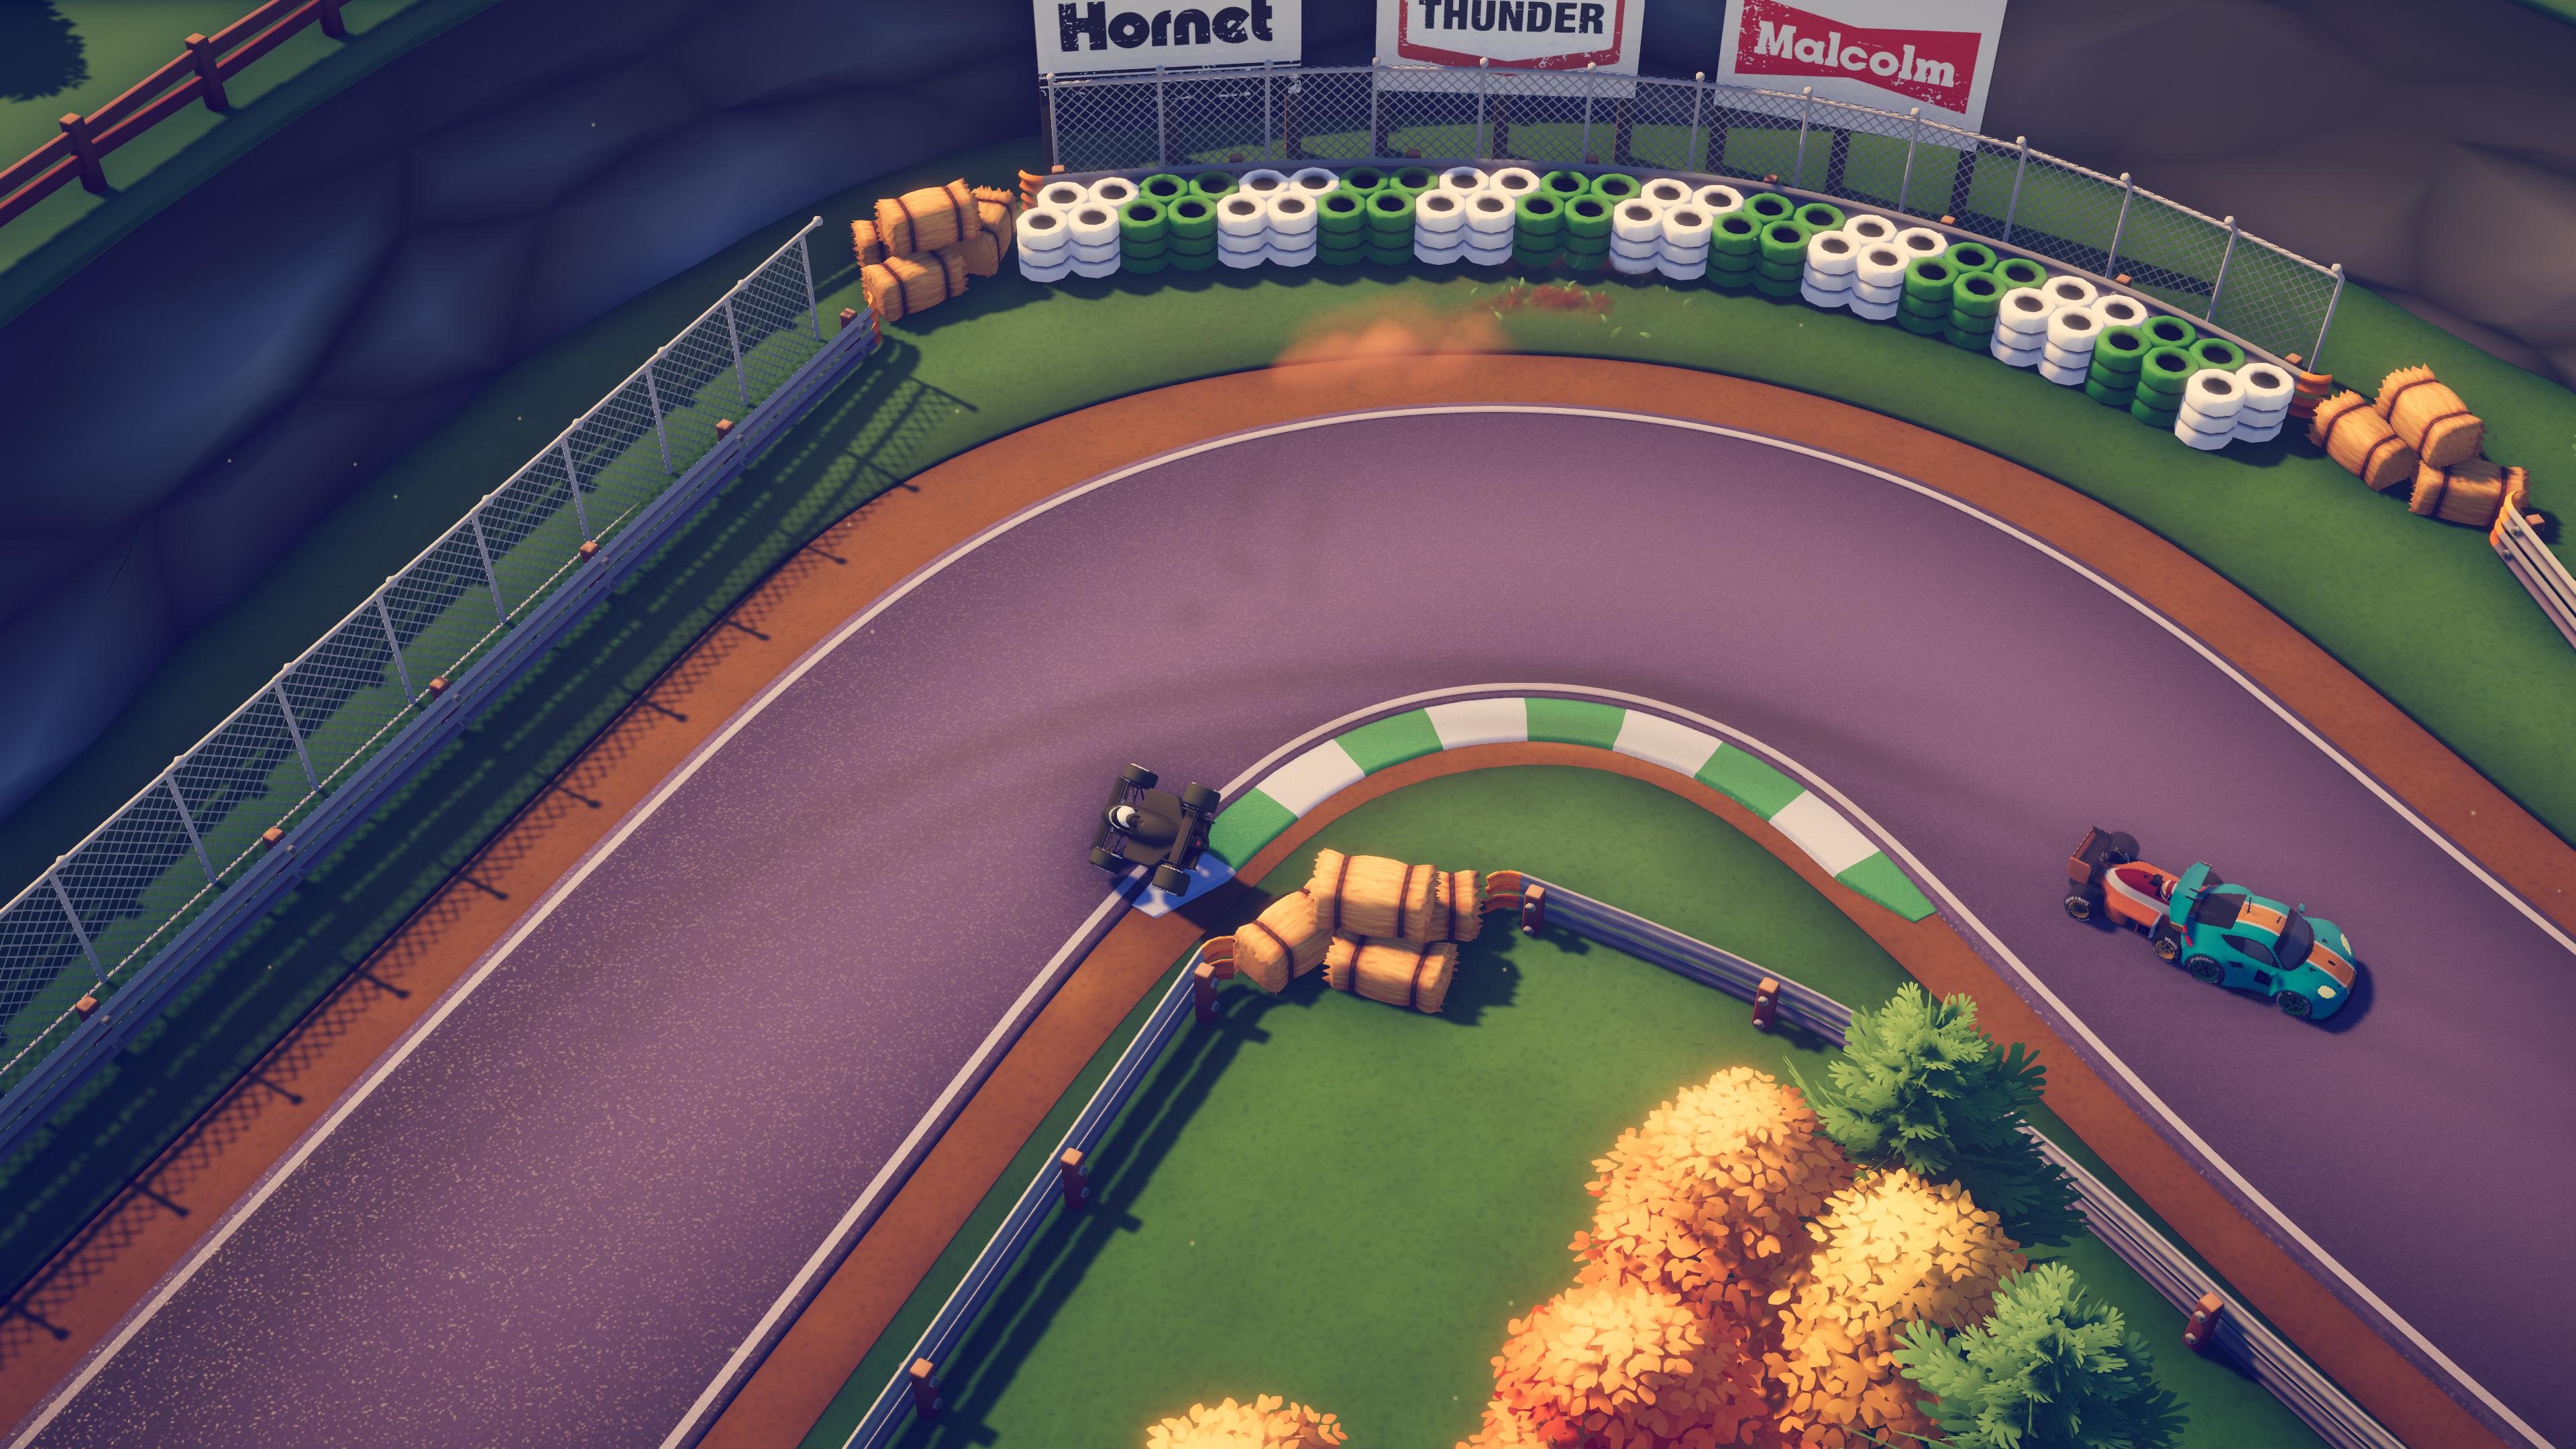 Circuit Superstars Screenshot 2021.04.14 - 13.10.59.44